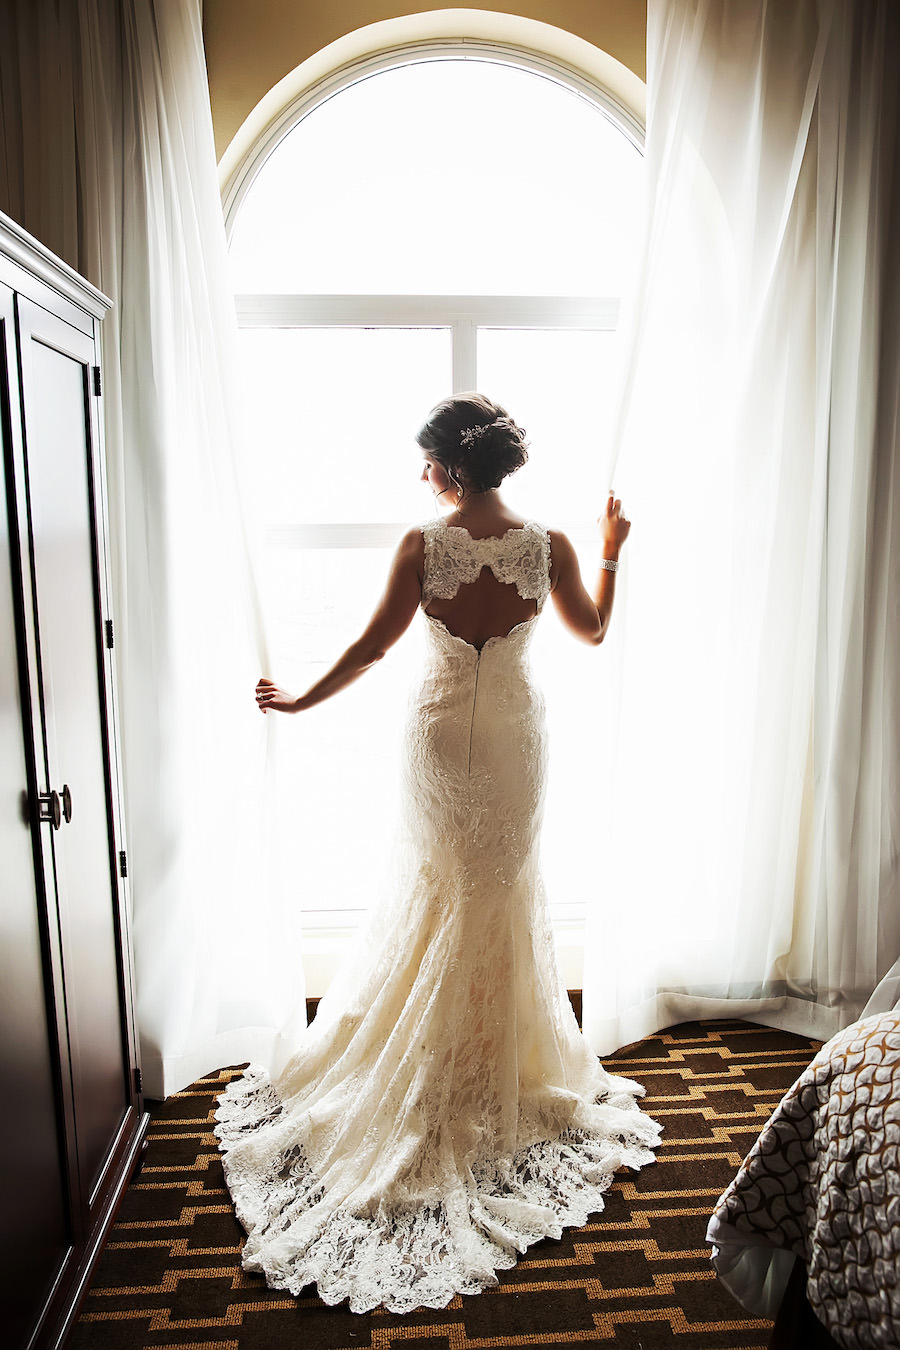 Bridal Wedding Portrait in Ivory, Lace Romona Keveza Wedding Dress | Tampa Wedding Dress Shop Isabel O'Neil Bridal | Tampa Wedding Photographer Limelight Photography